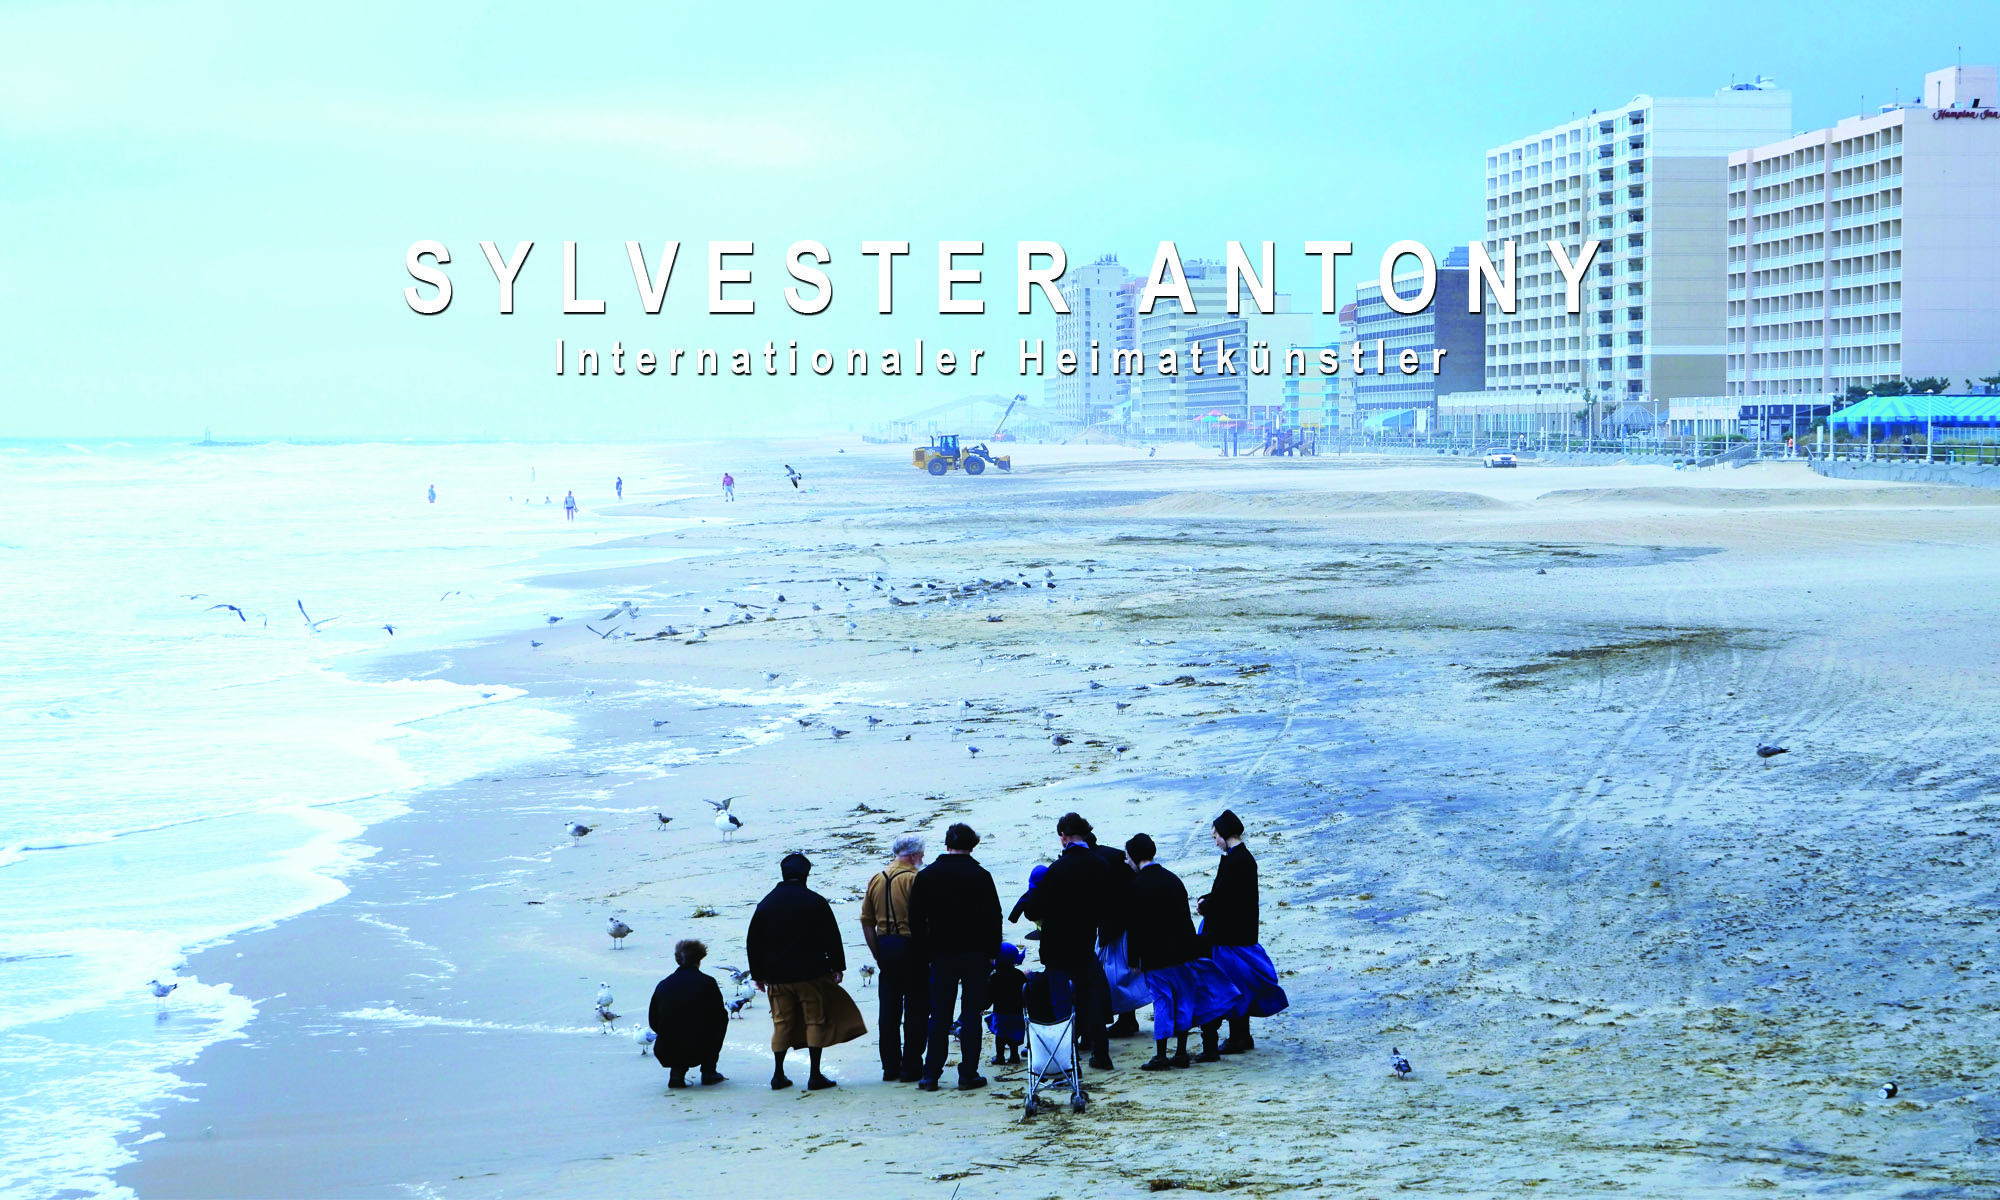 Sylvester Antony